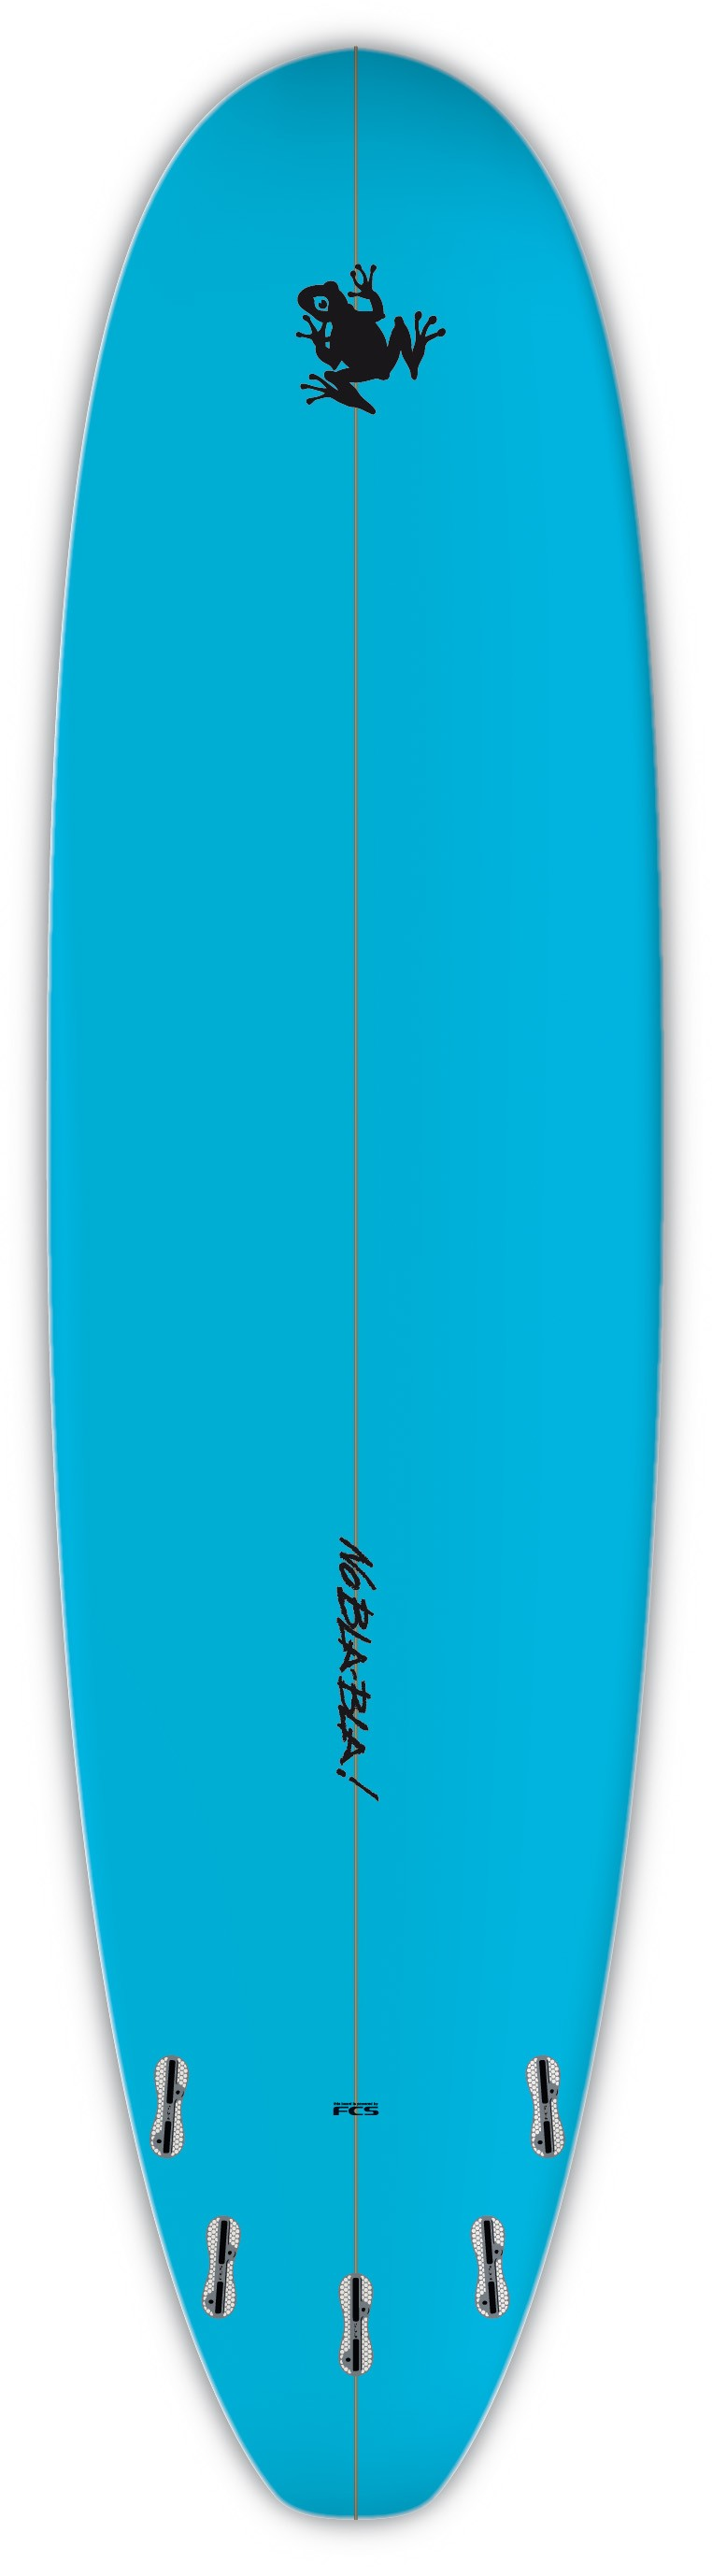 planche de surf superfrog 7 39 4 mini noserider la planche. Black Bedroom Furniture Sets. Home Design Ideas